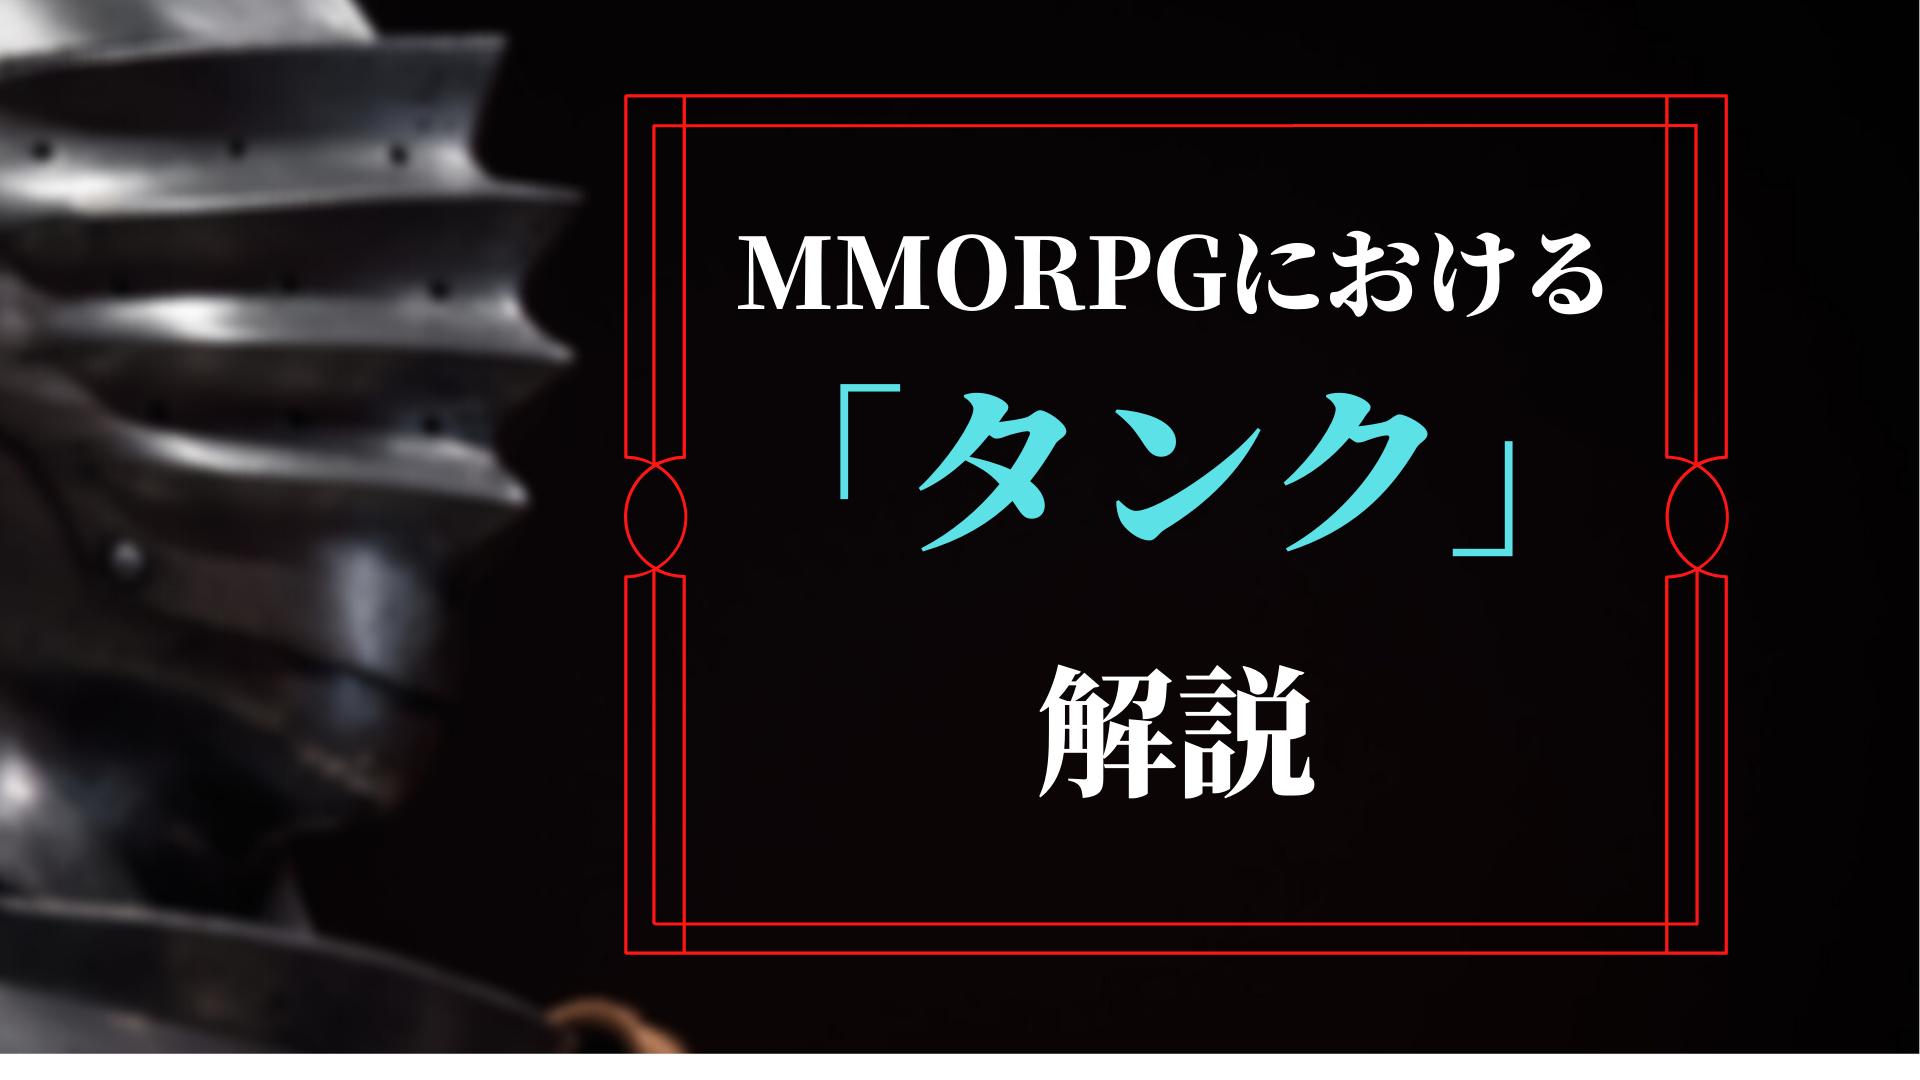 MMORPGにおける「タンク」解説